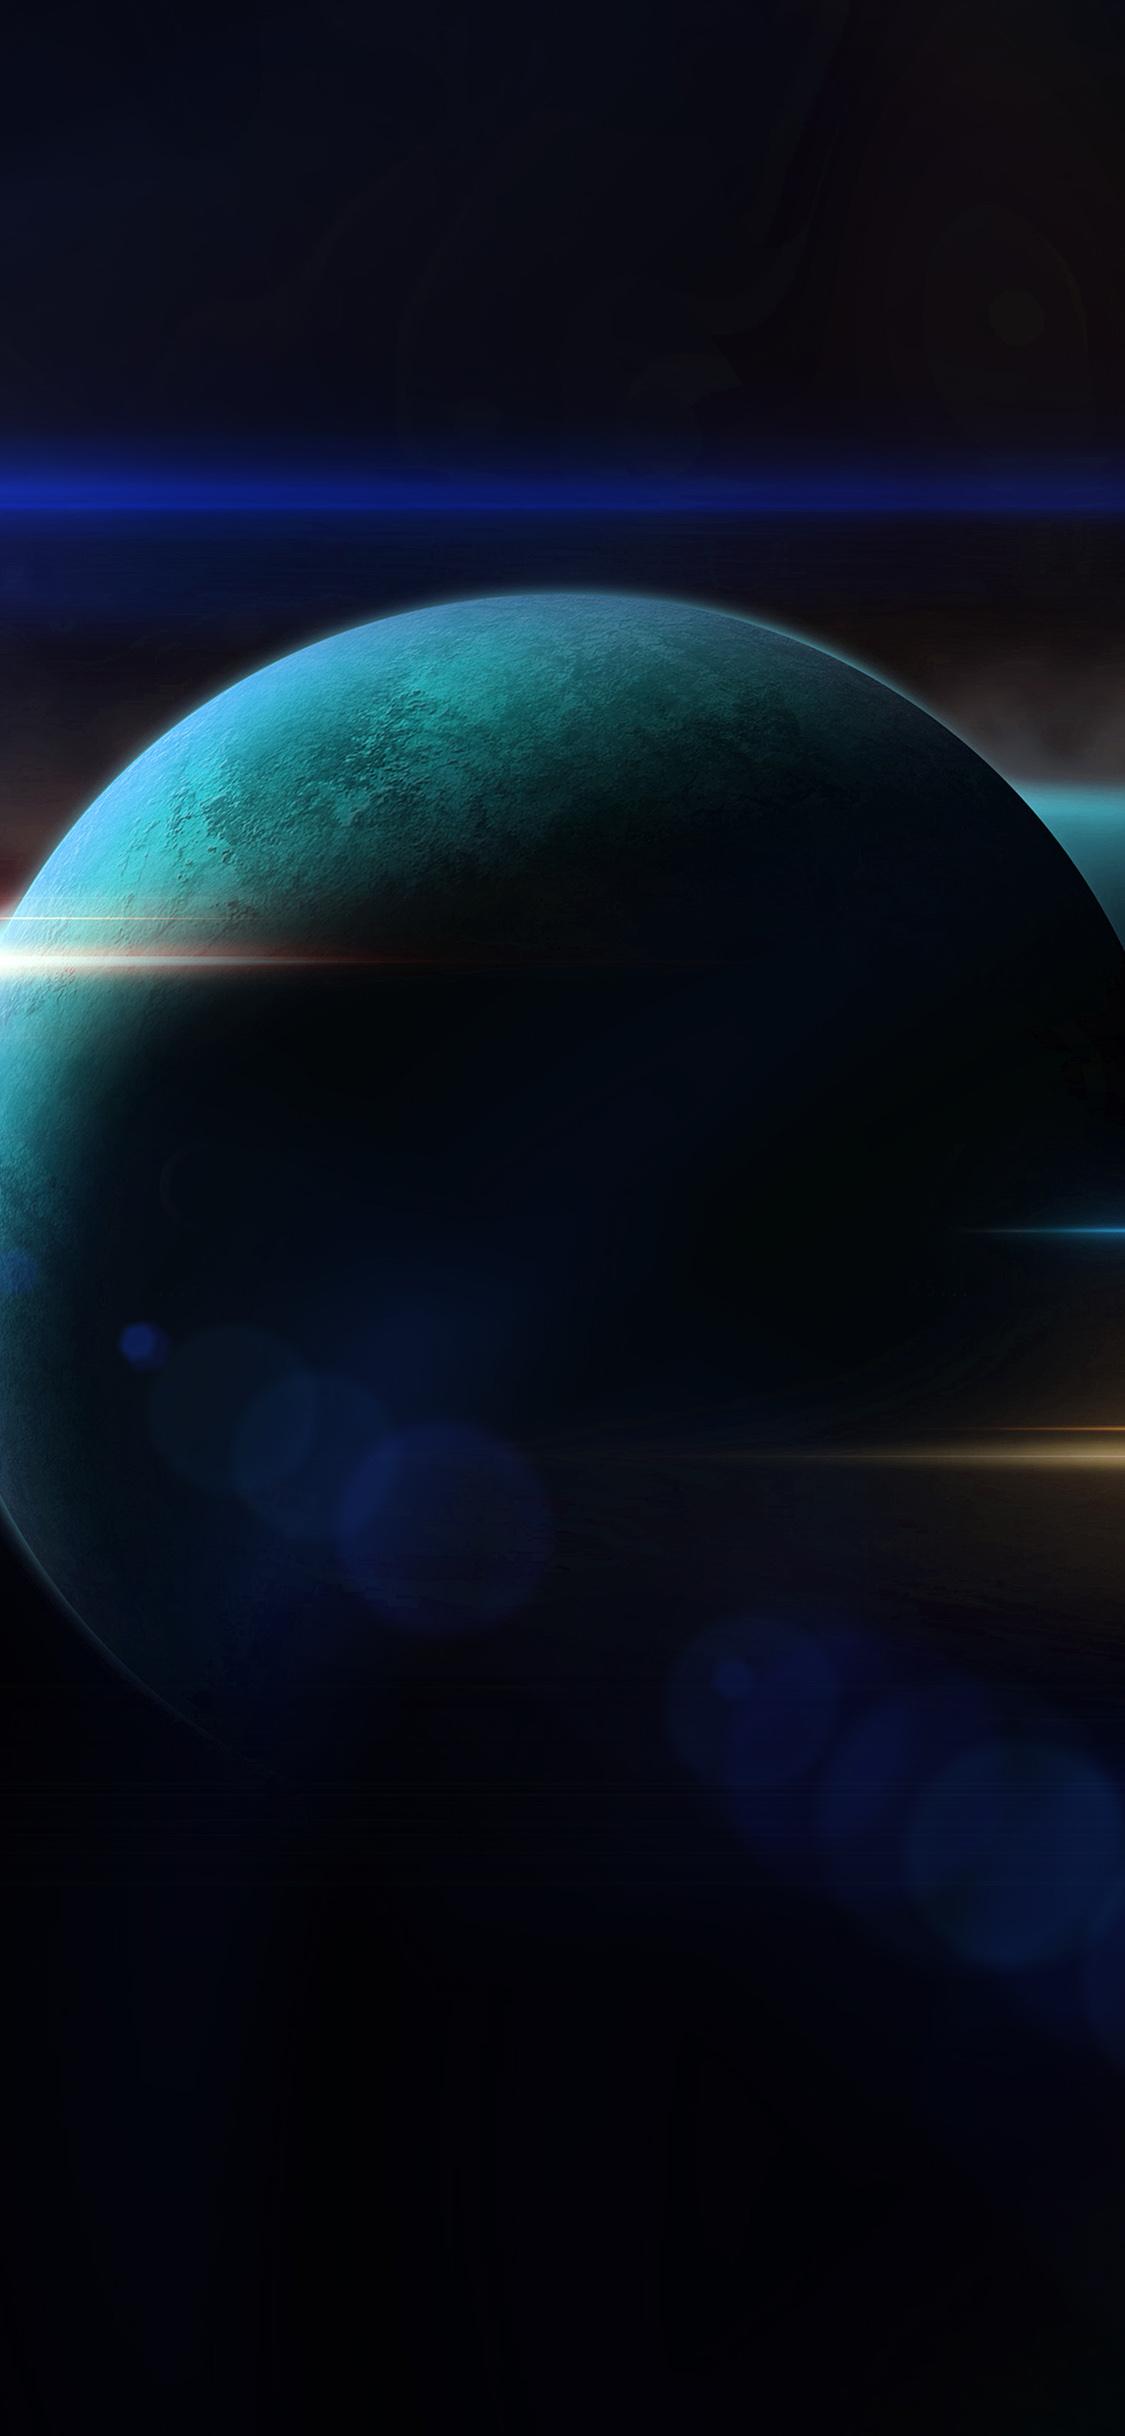 iPhoneXpapers.com-Apple-iPhone-wallpaper-ag64-universe-nasa-space-planet-art